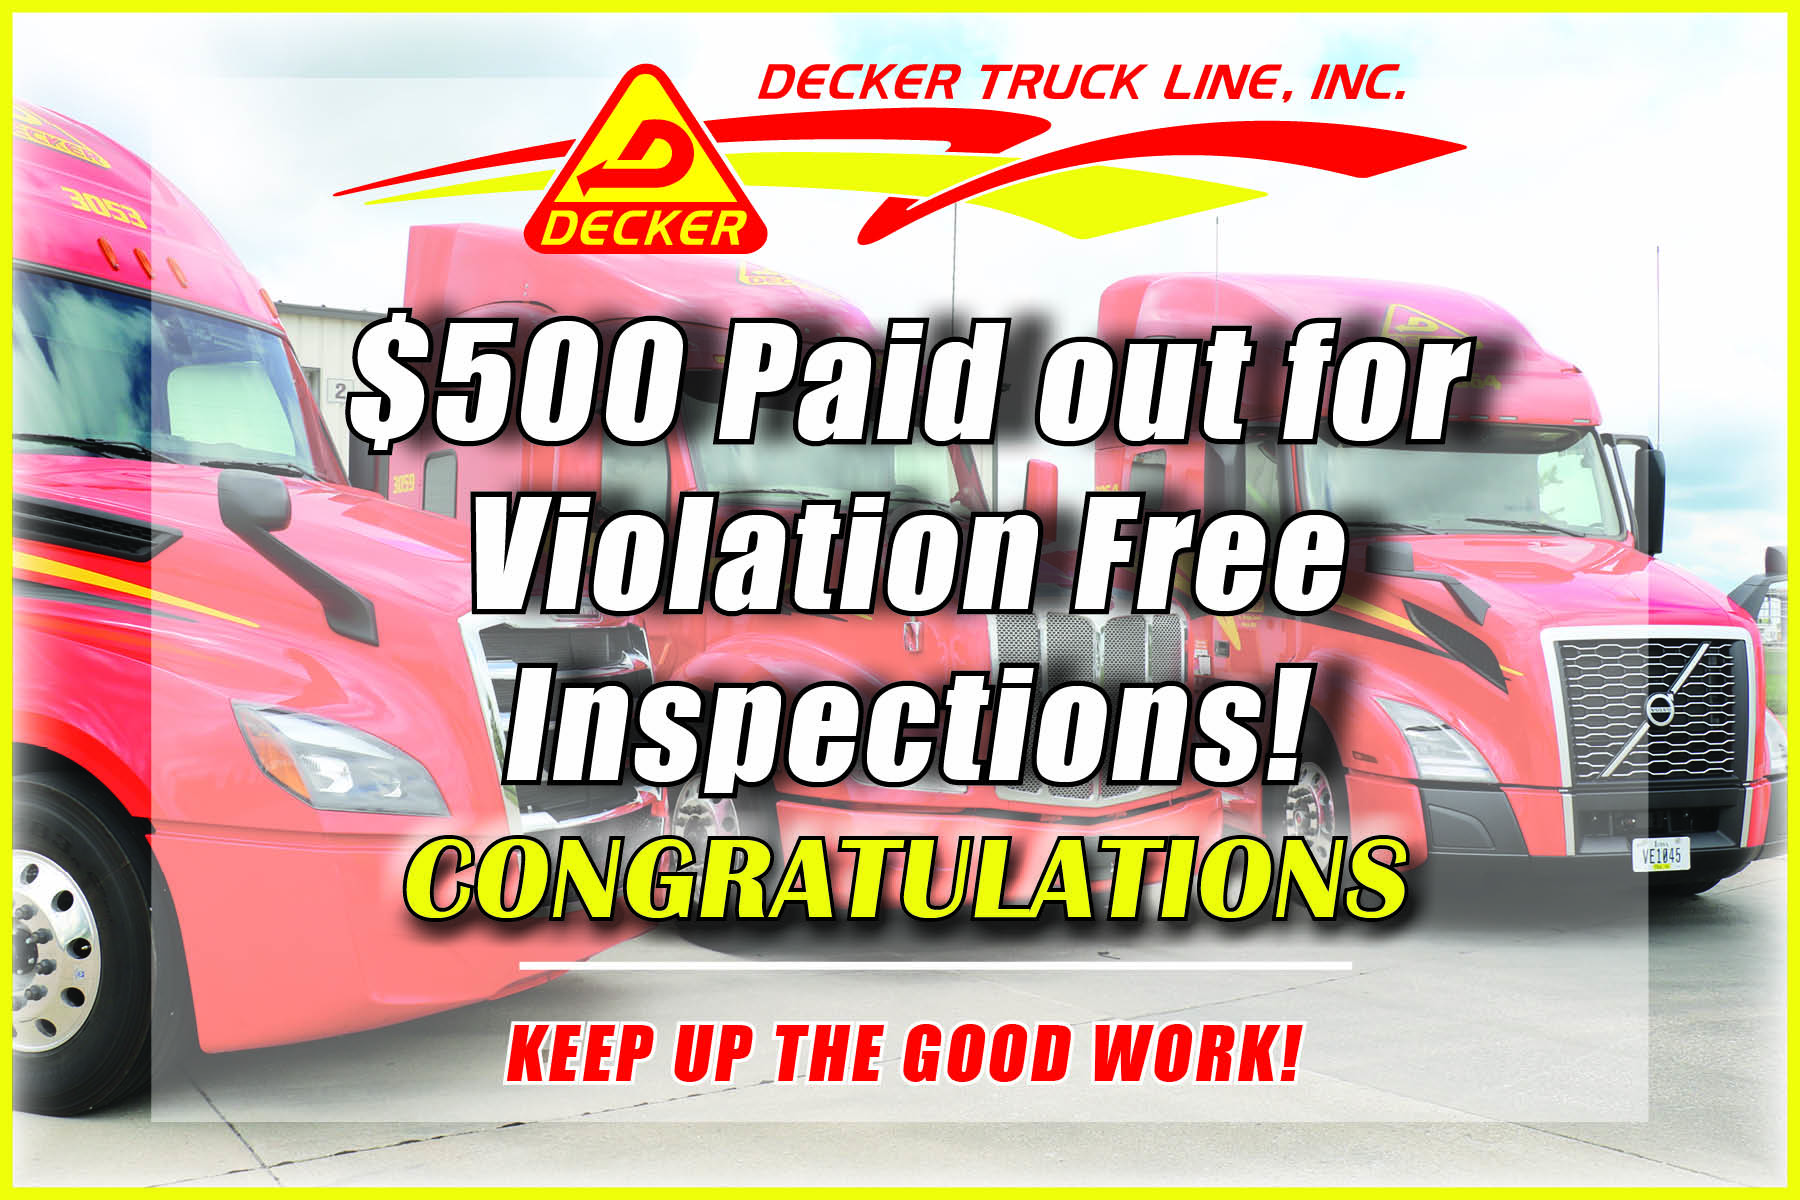 Inspections Bonuses 10/19/18-10/25/18